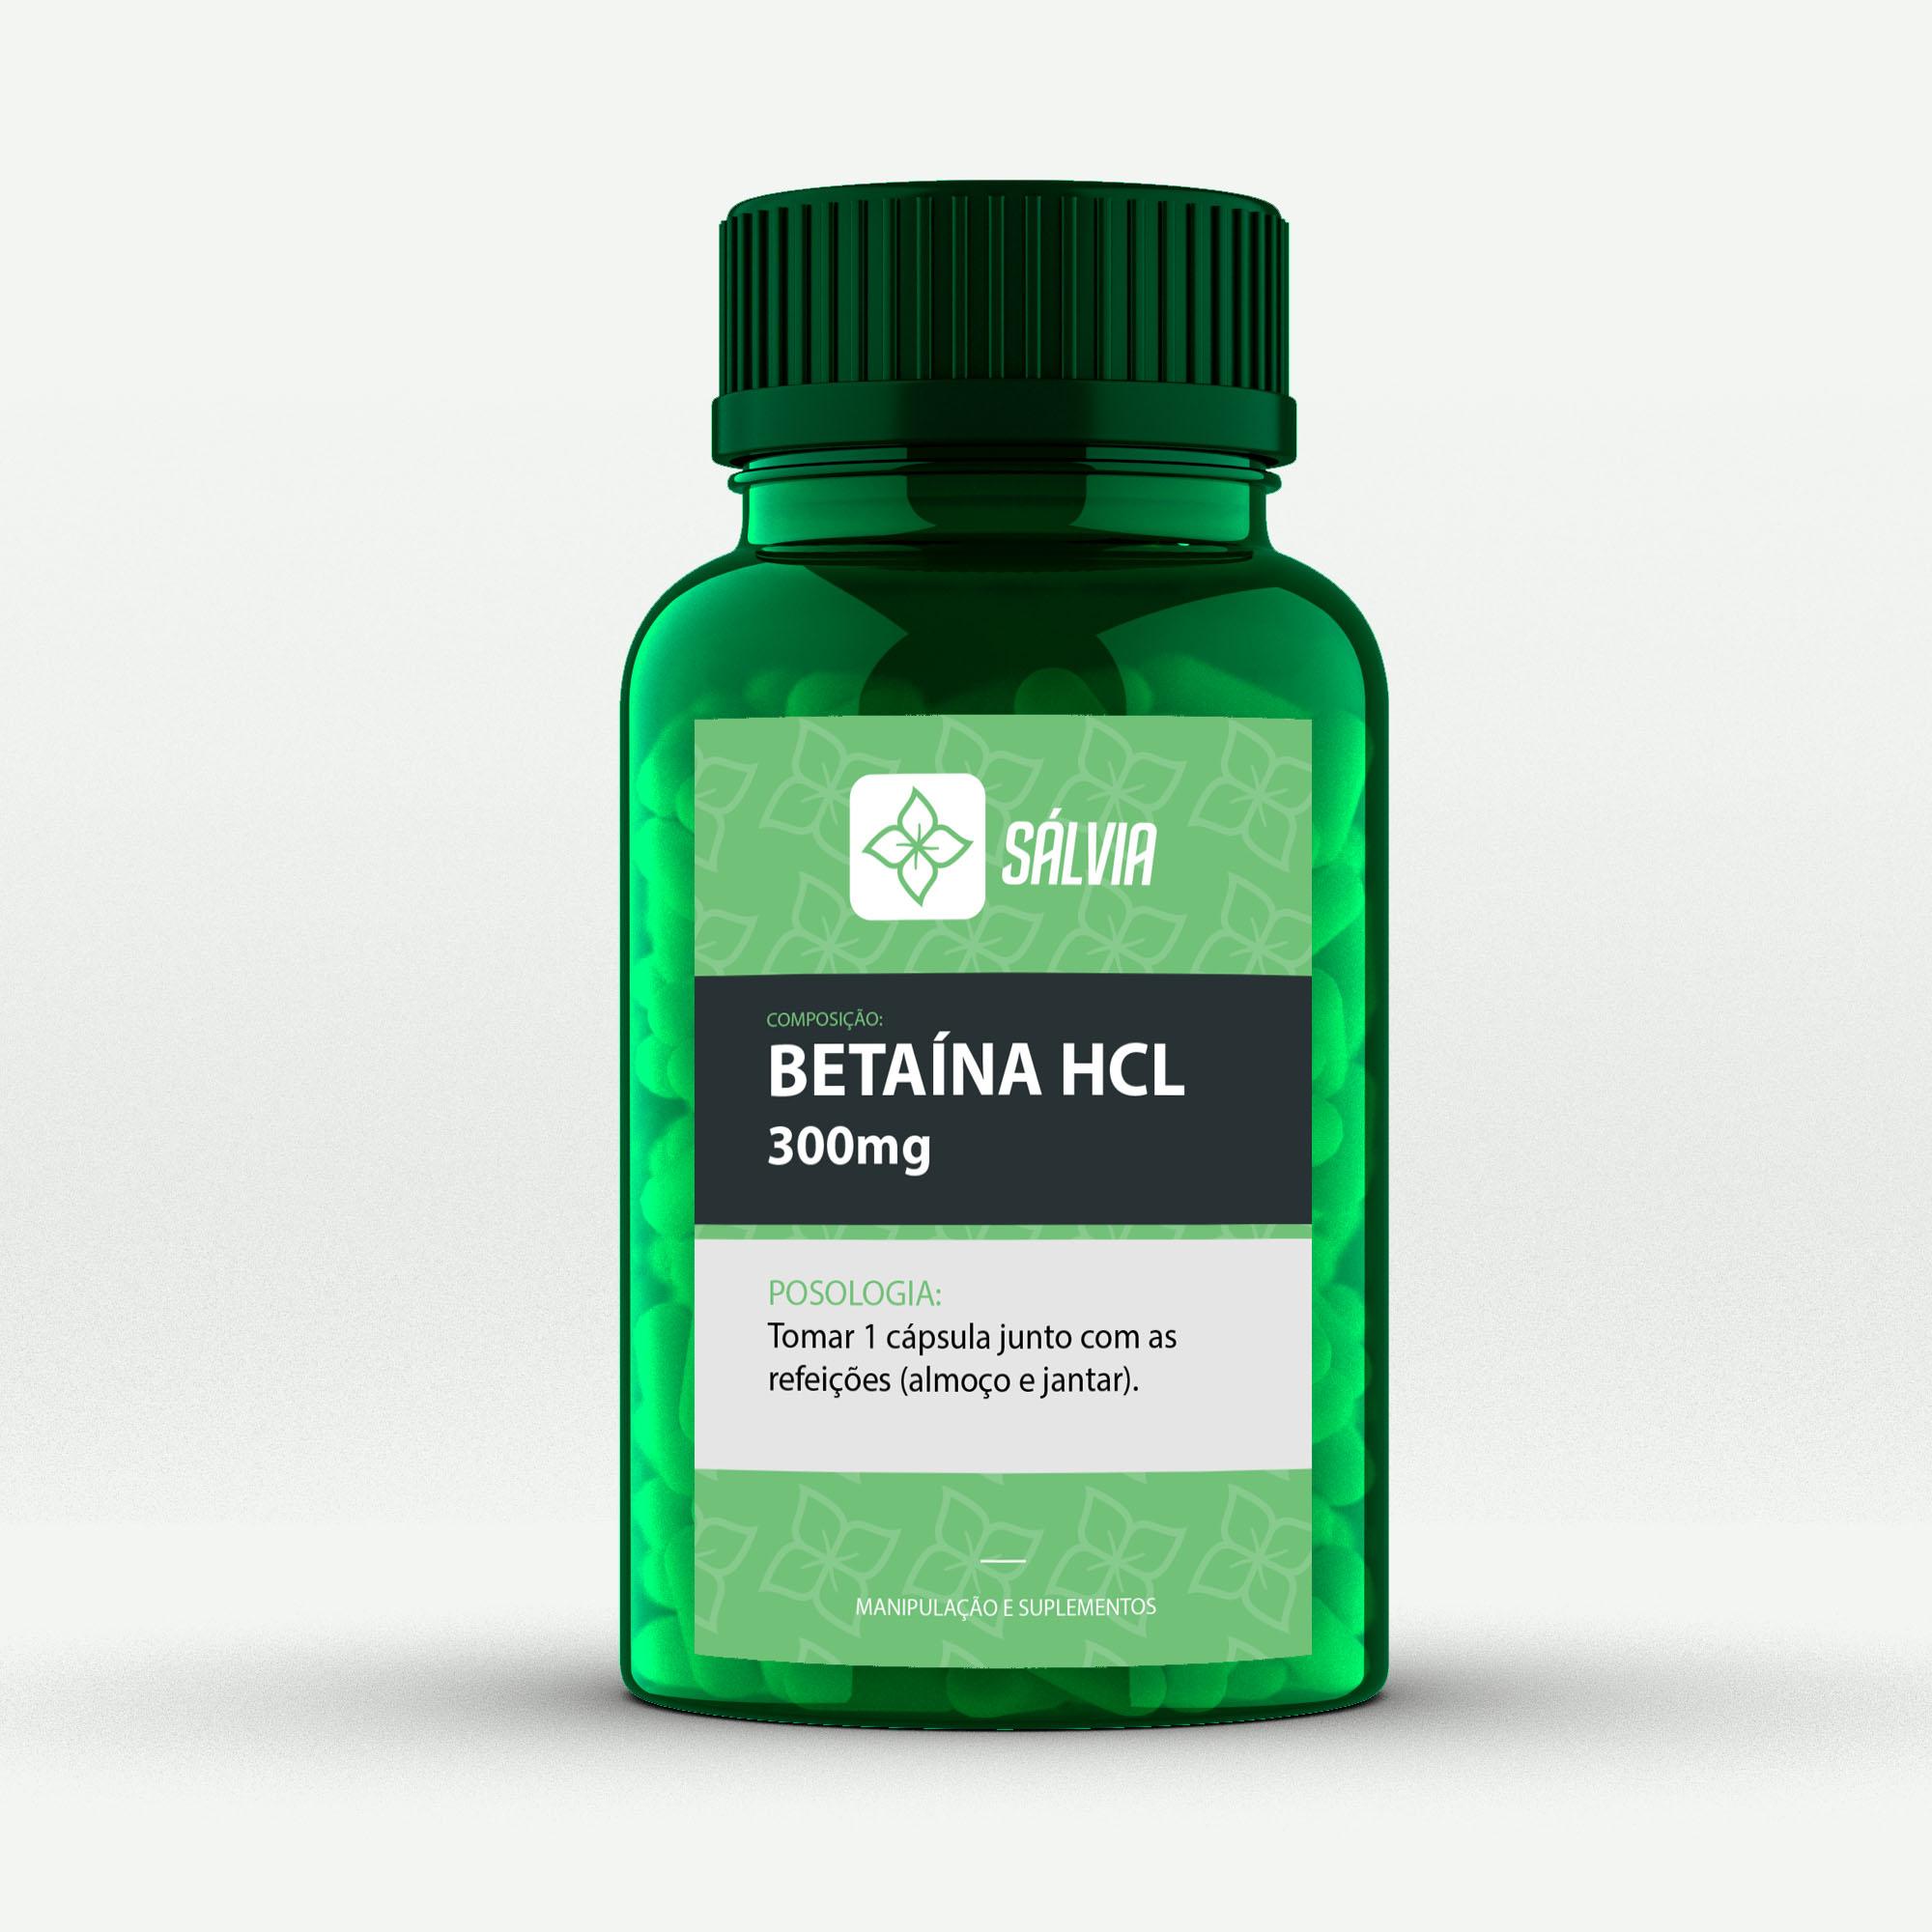 BETAÍNA HCL 300mg - Cápsulas